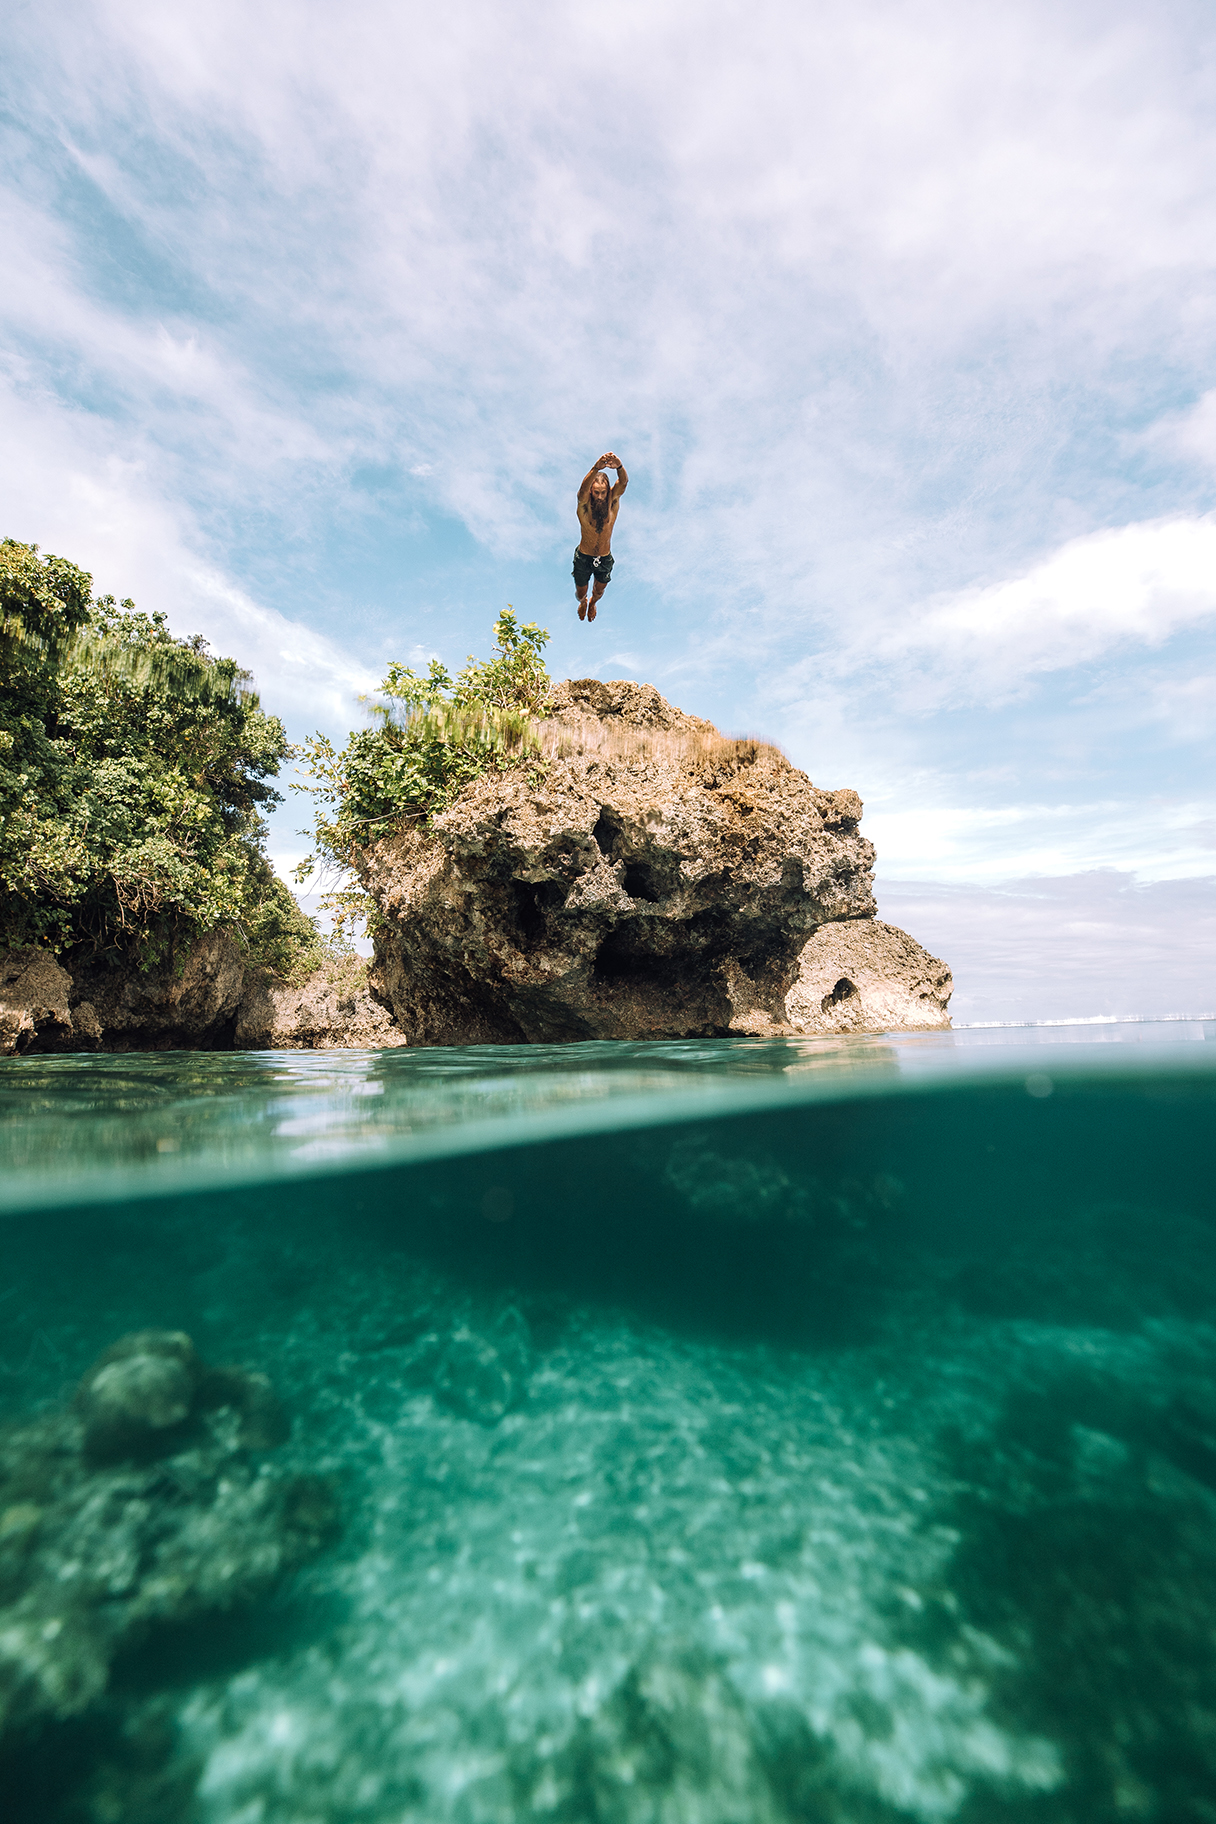 Philippines_DOT_Siagrao-2288